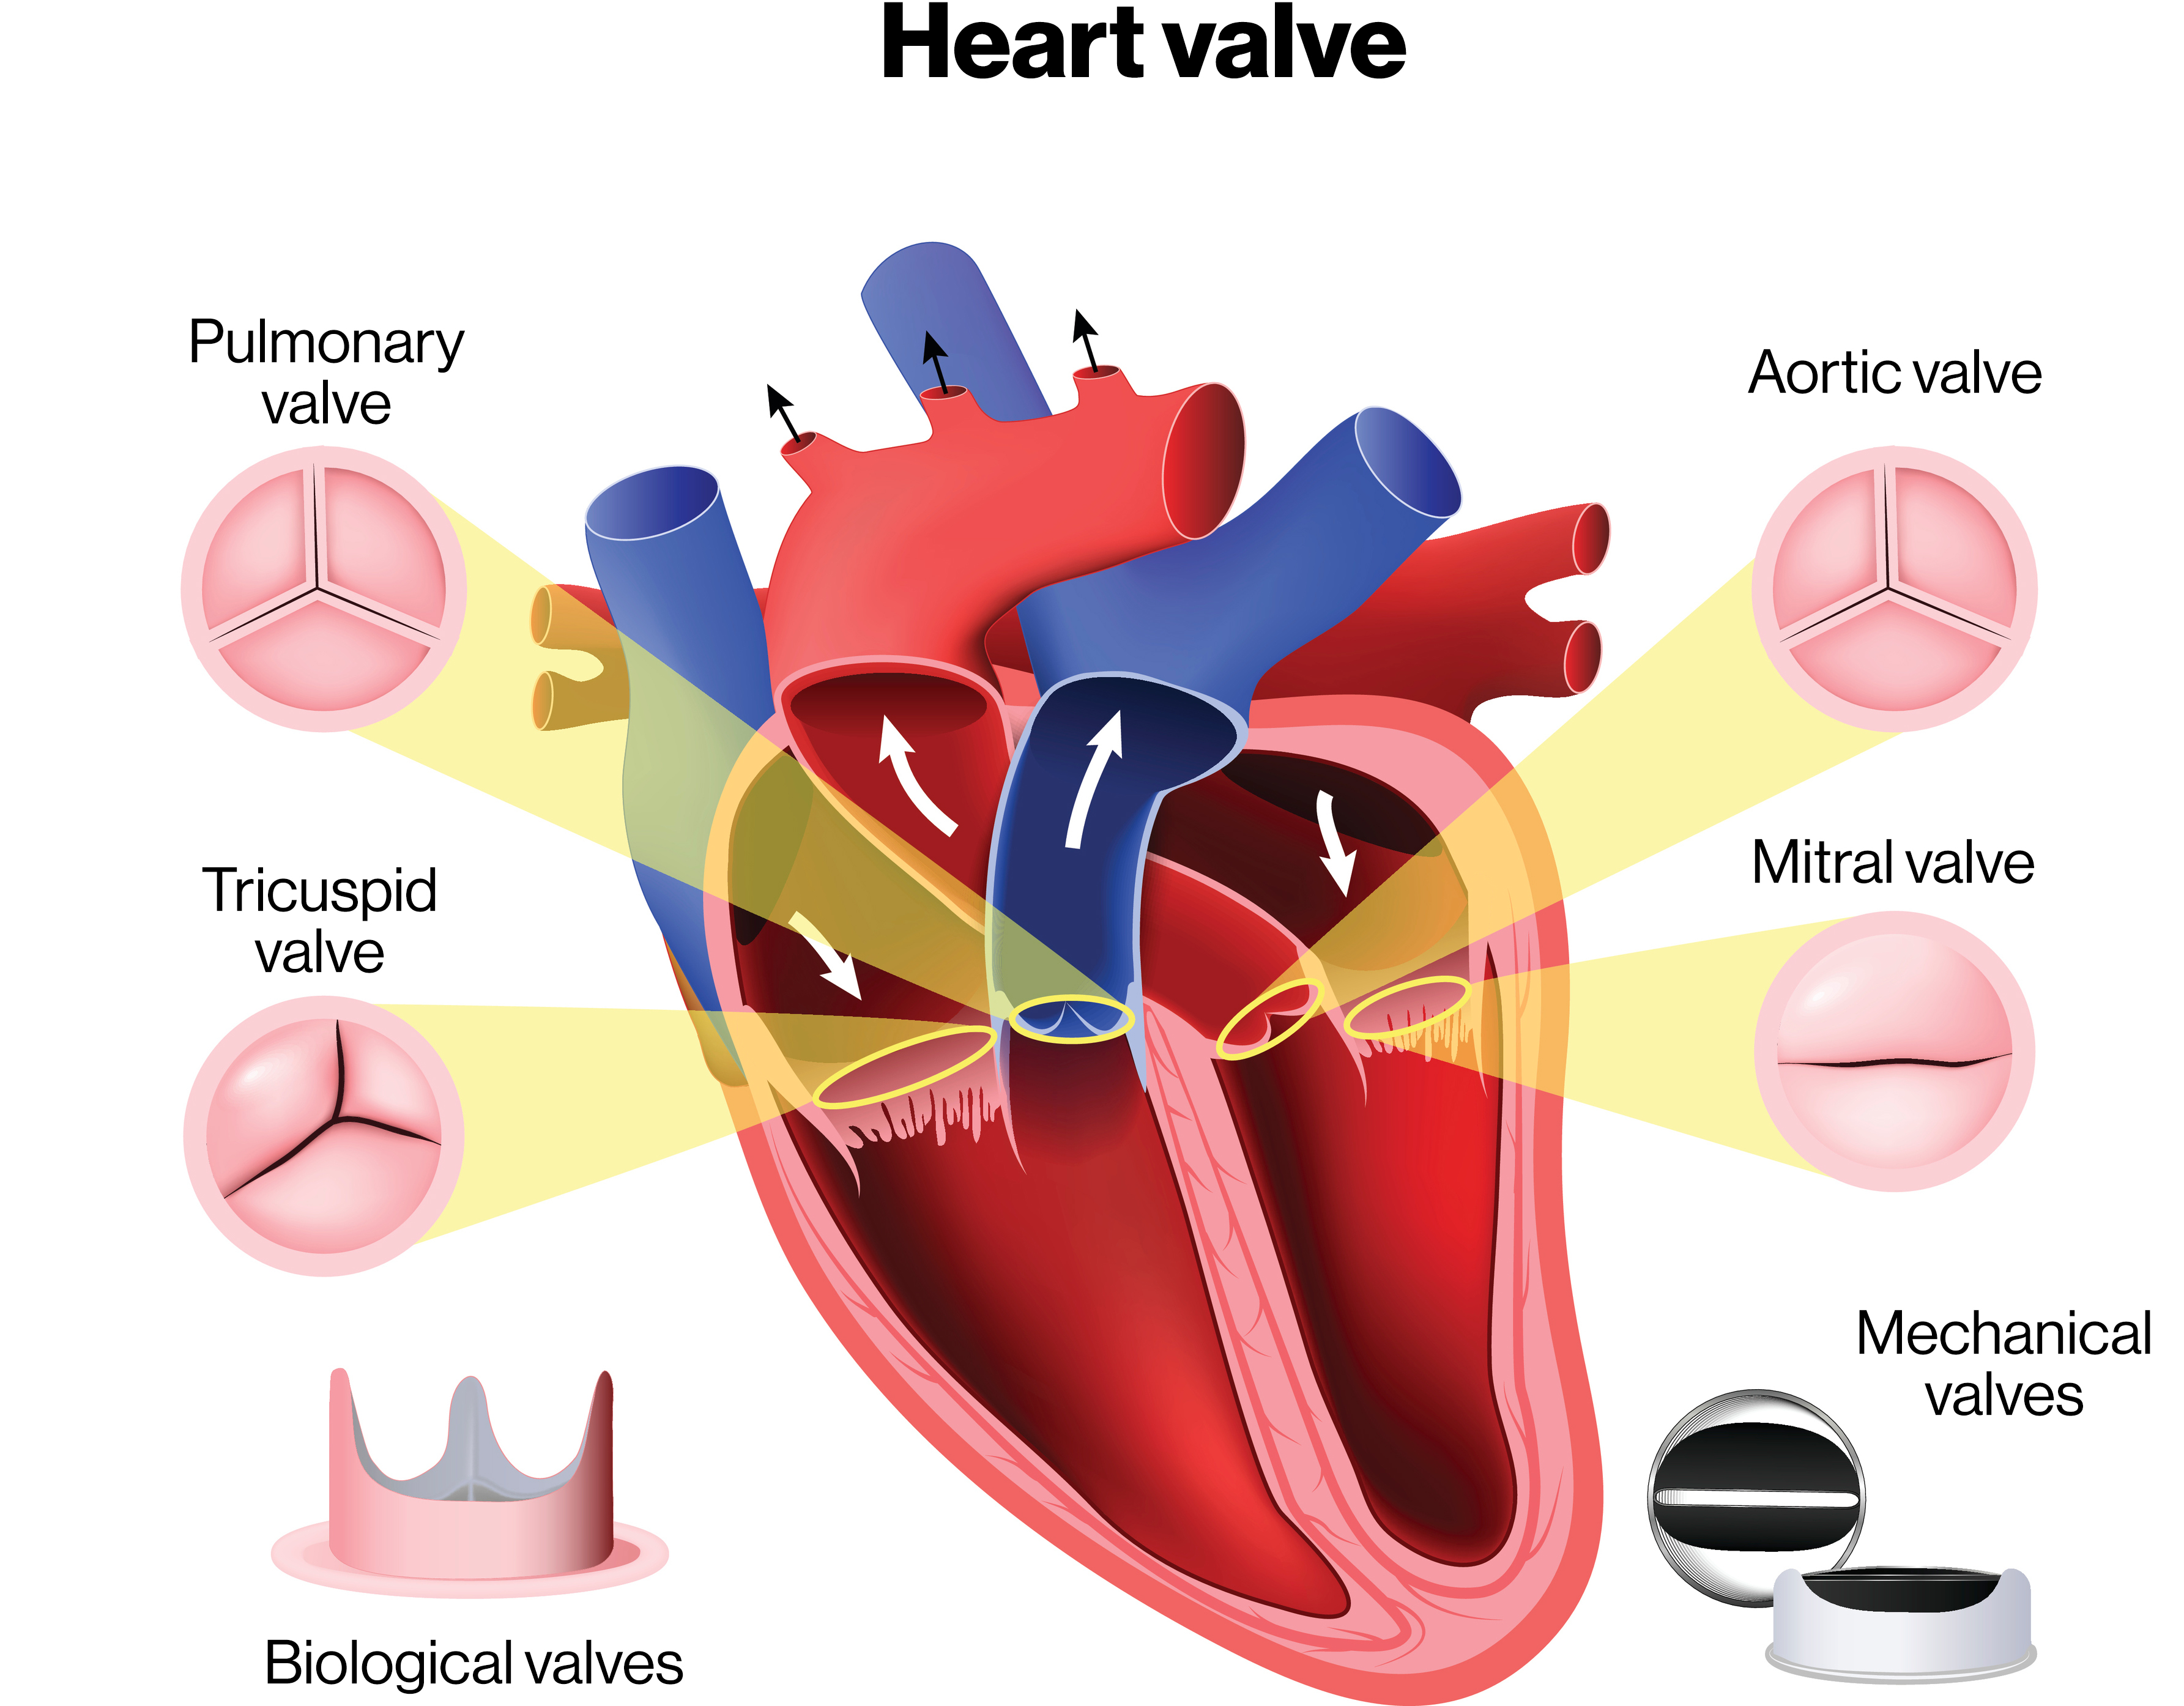 heart valve illustration_en_v1.ashx?h=393&w=500&hash=ABF3408161A67E22C3675B7F0837F4E0F131E7B0&la=en valvular heart disease heart and stroke foundation